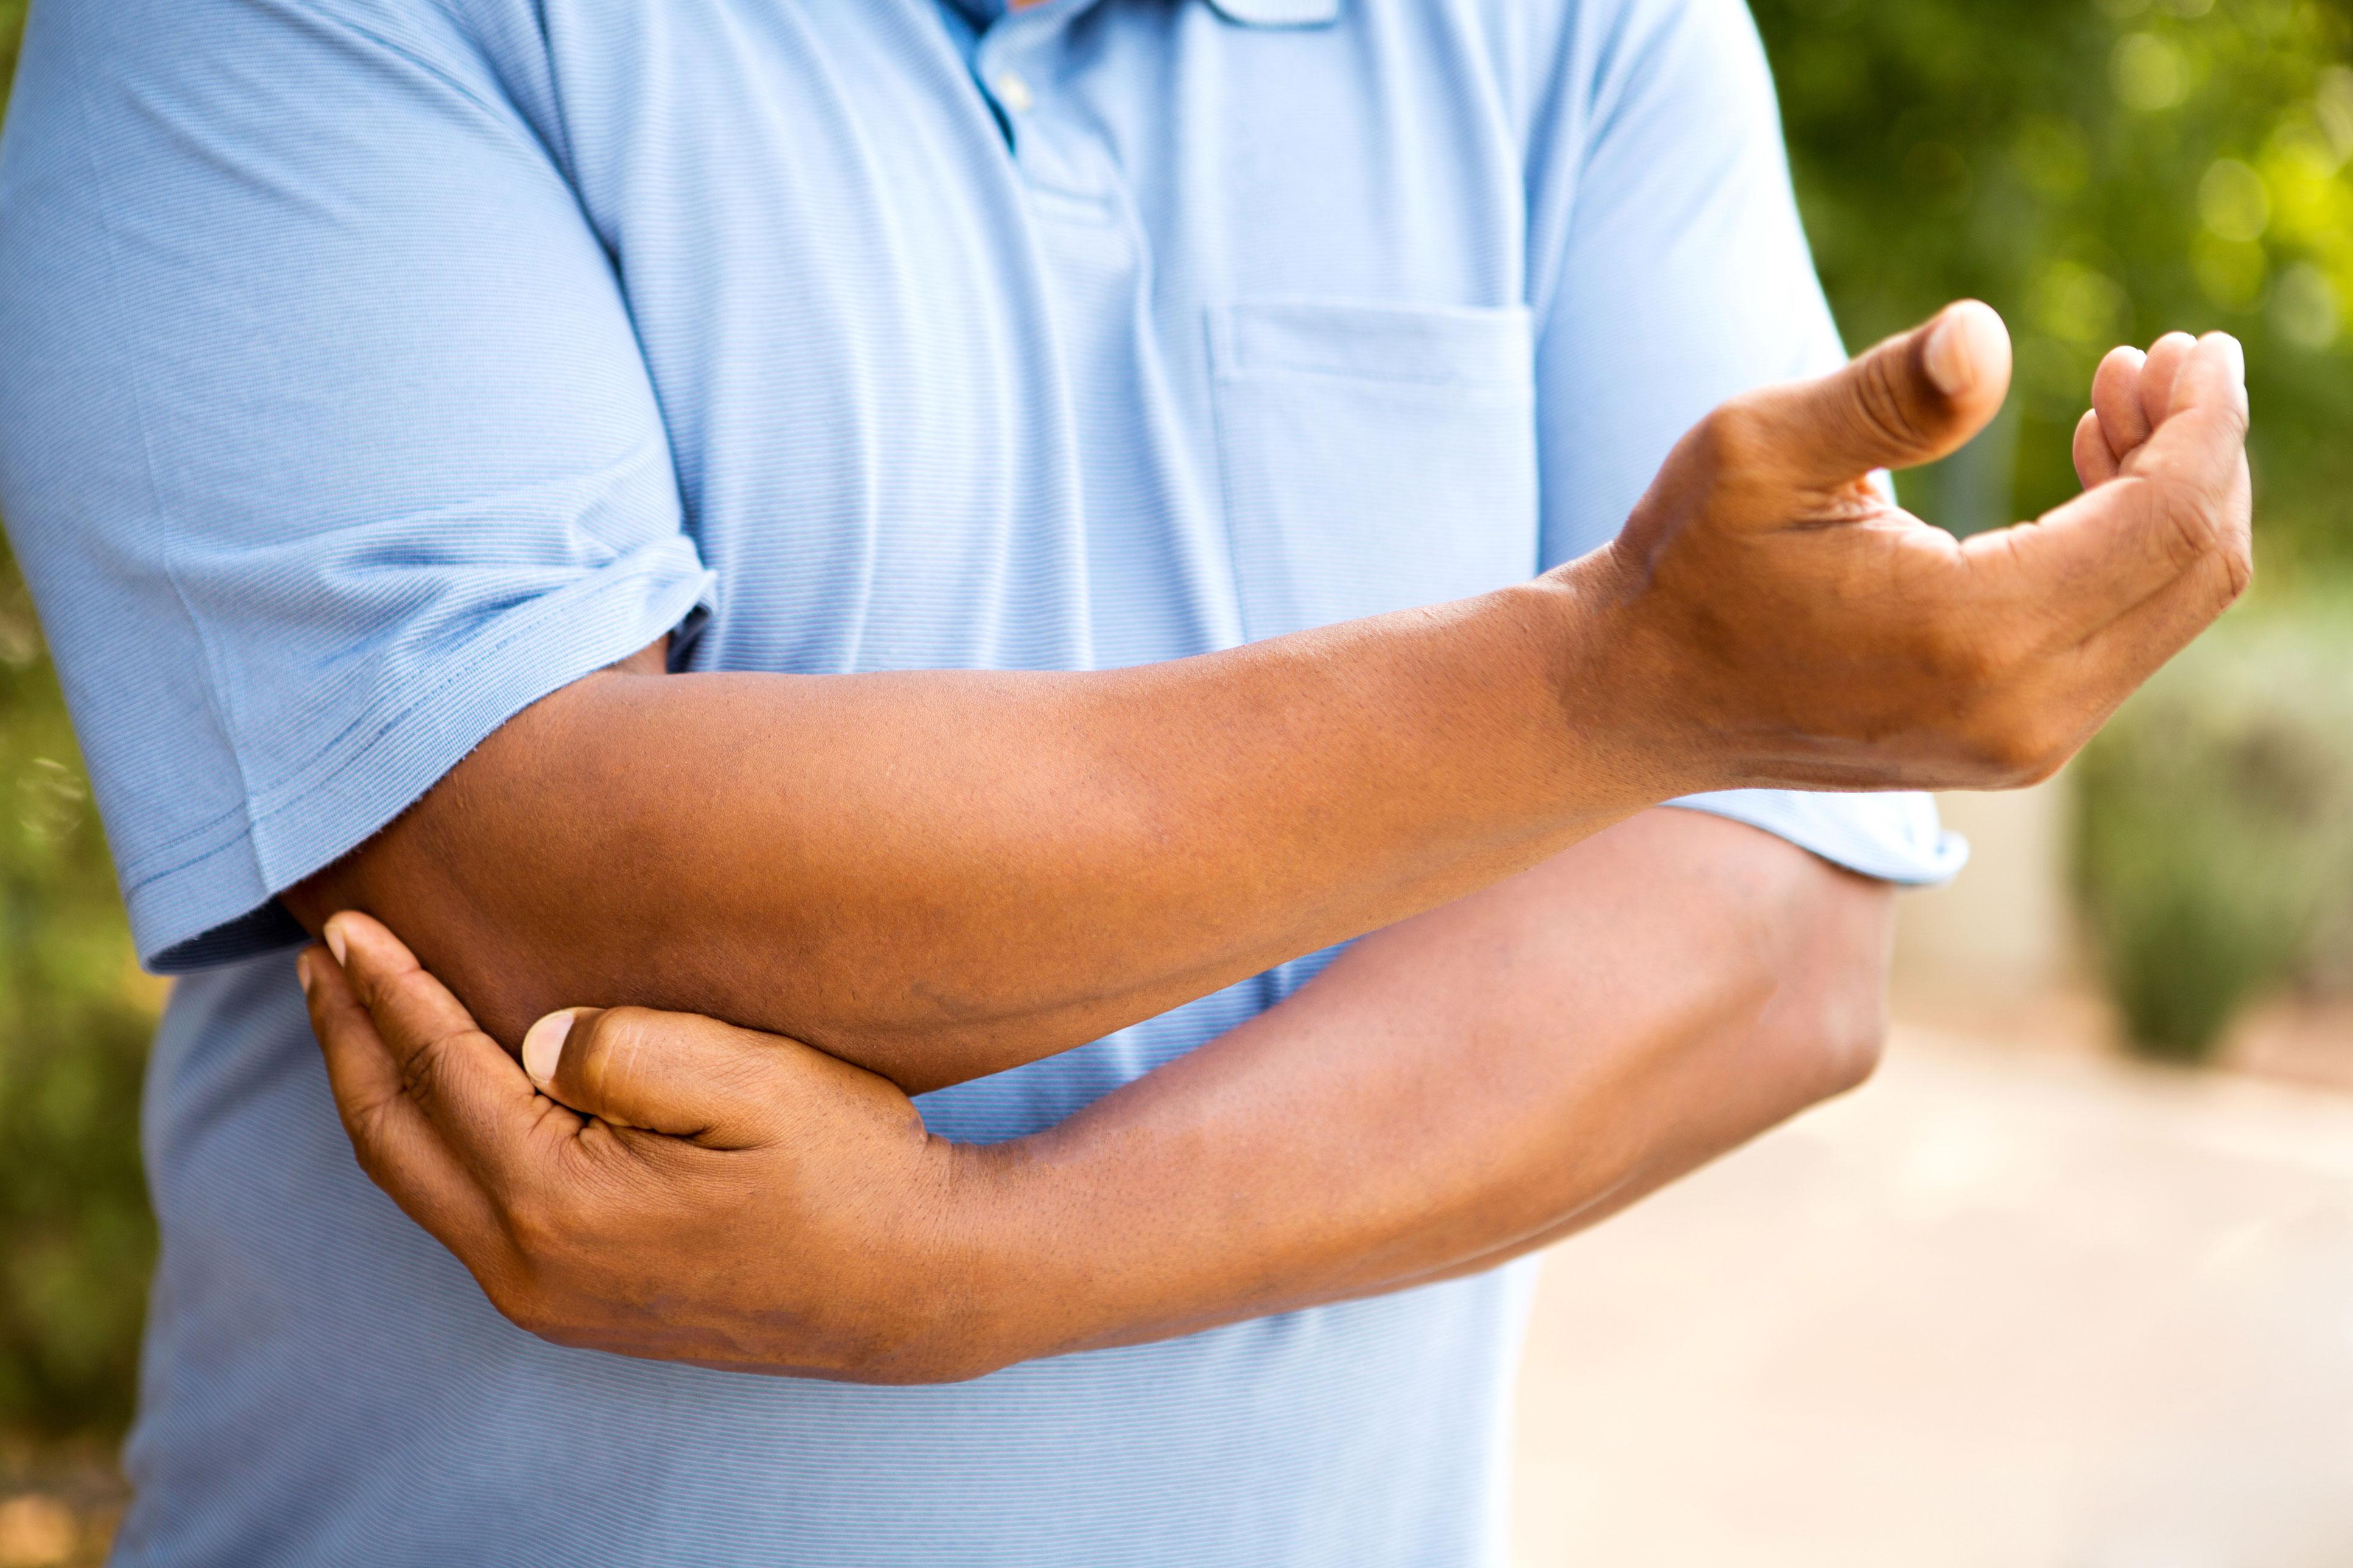 Caucasian man holding his elbow in pain